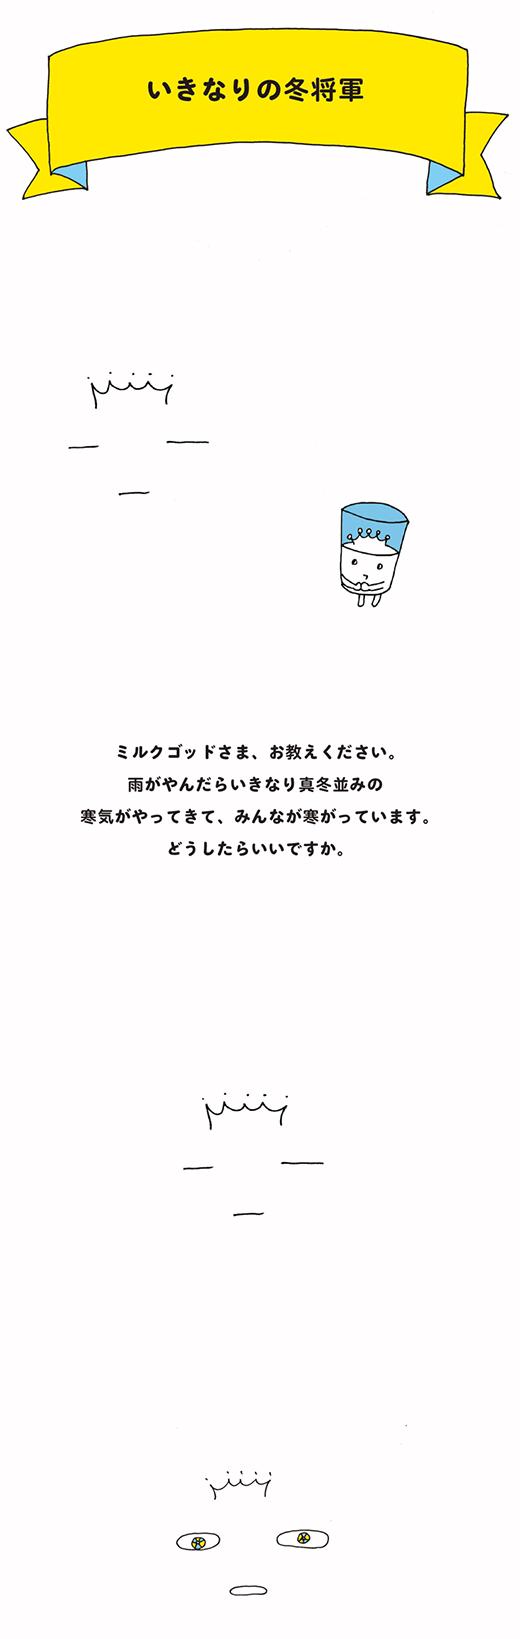 milGOD_1113_01